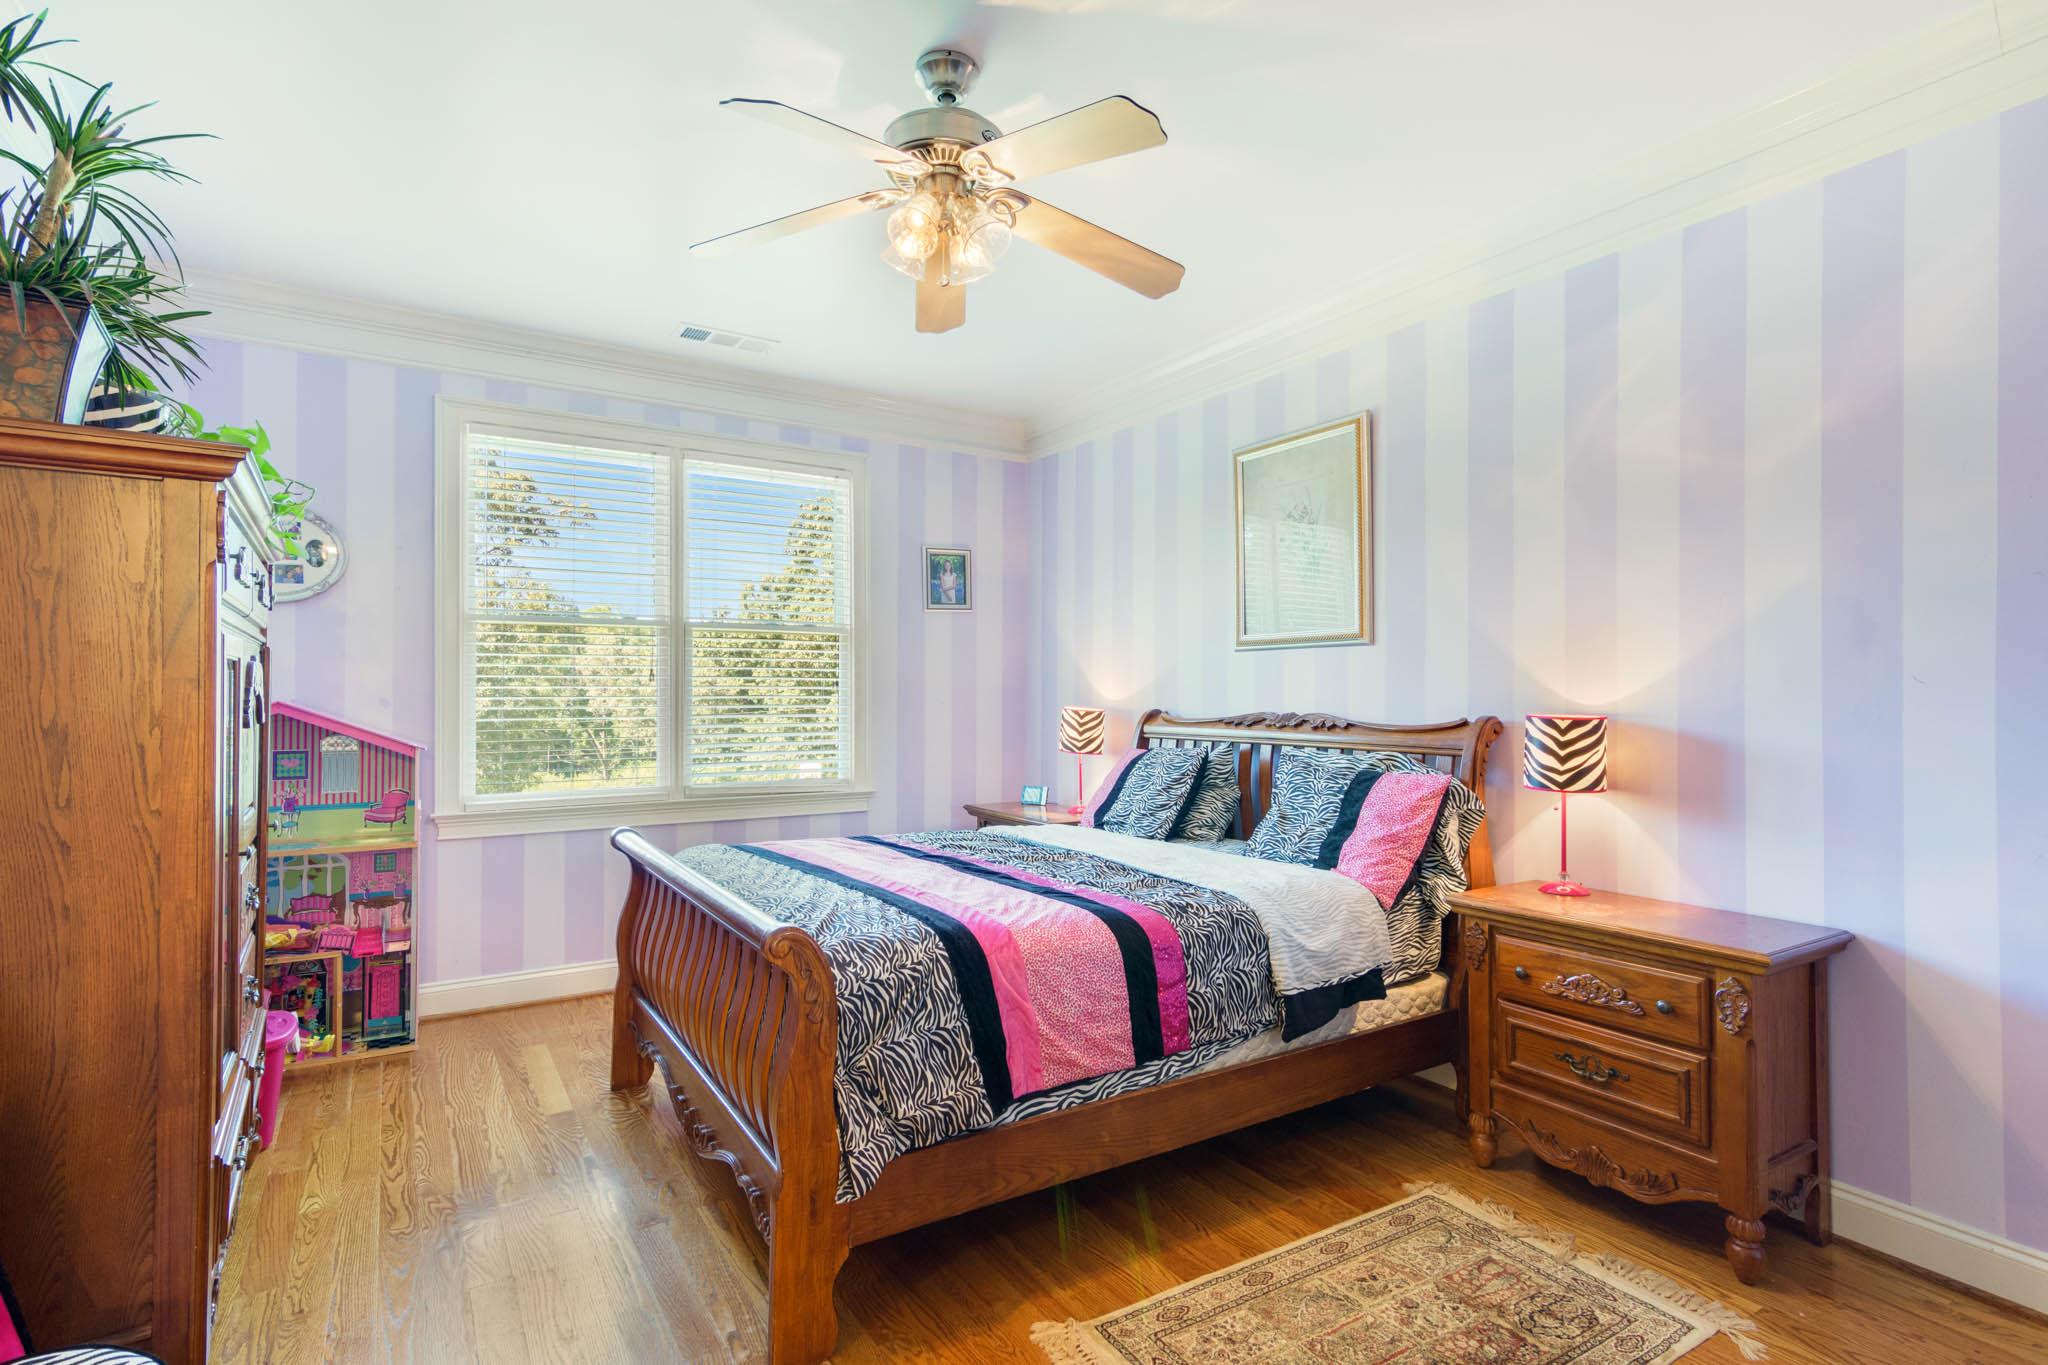 real_estate_photographer_bedroom_photography-8.jpg